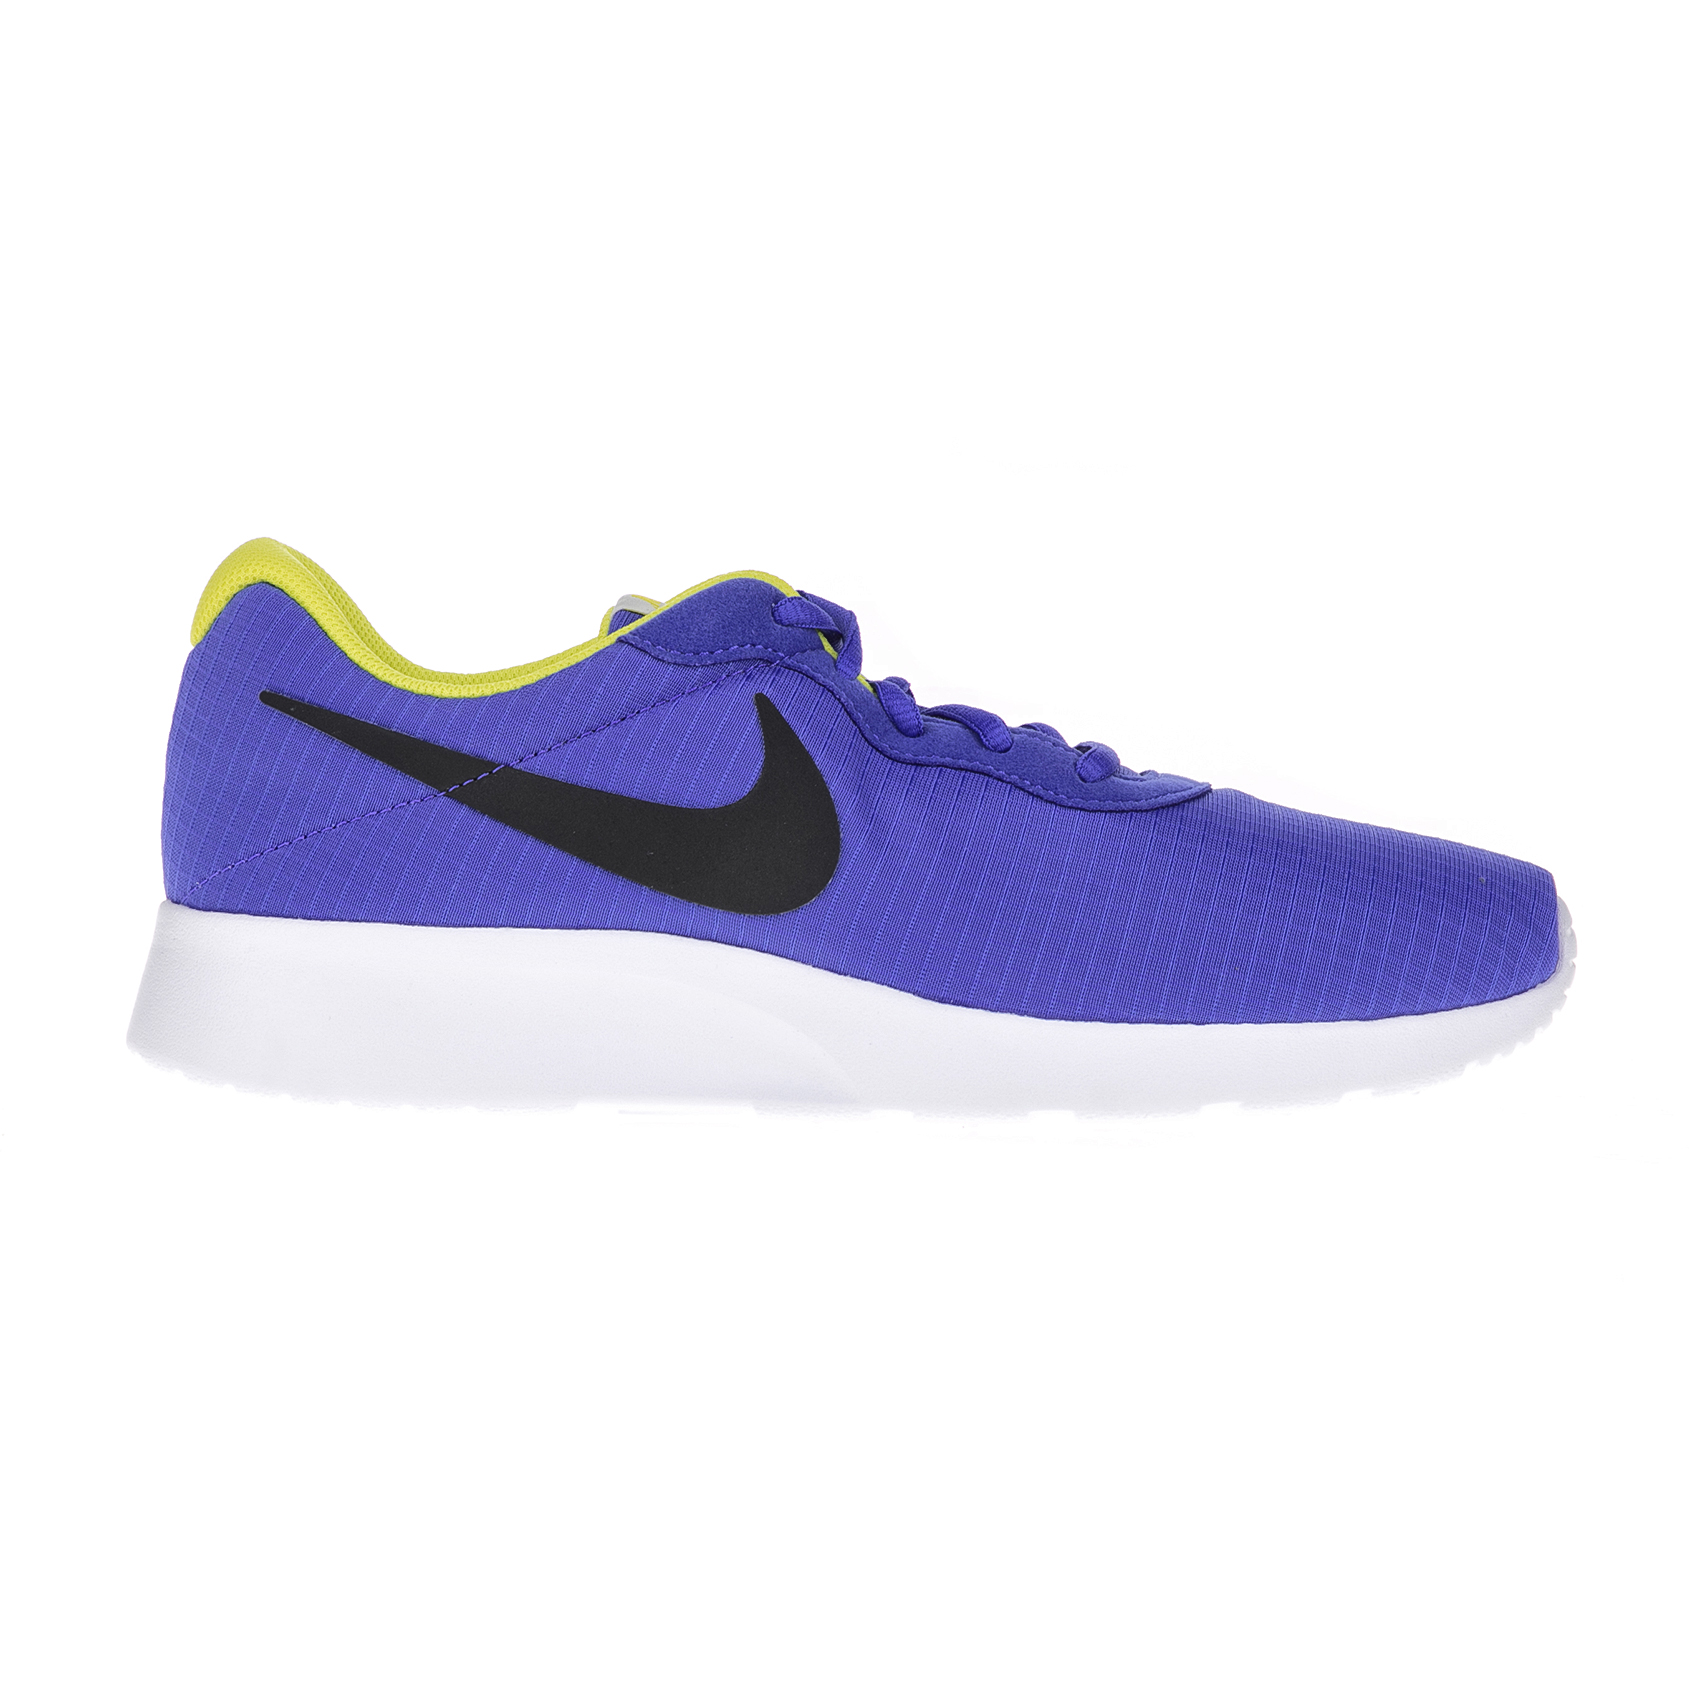 NIKE – Ανδρικά αθλητικά παπούτσια NIKE TANJUN PREM μοβ-κίτρινο